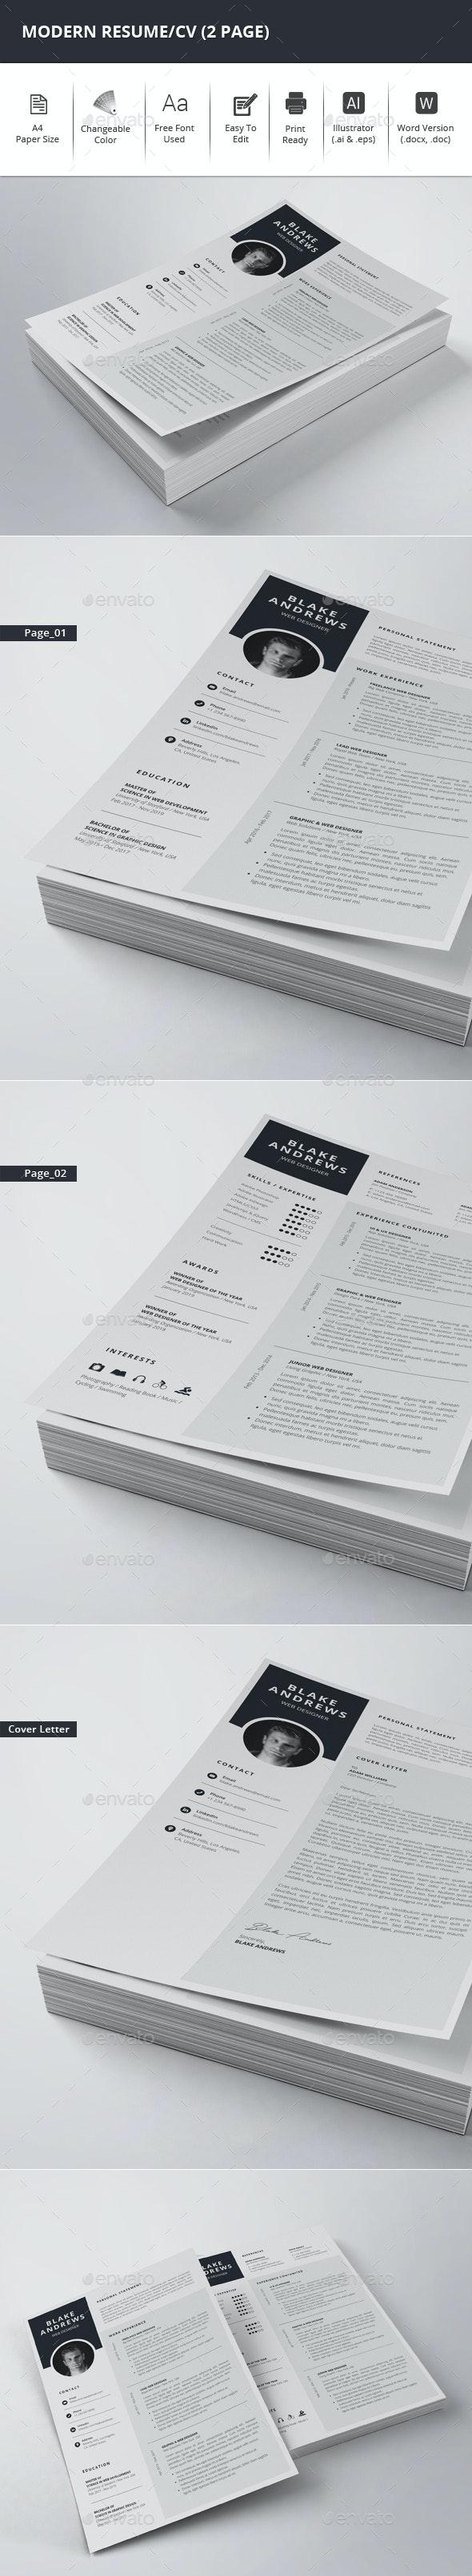 Modern Resume/CV (2 Page) - Resumes Stationery